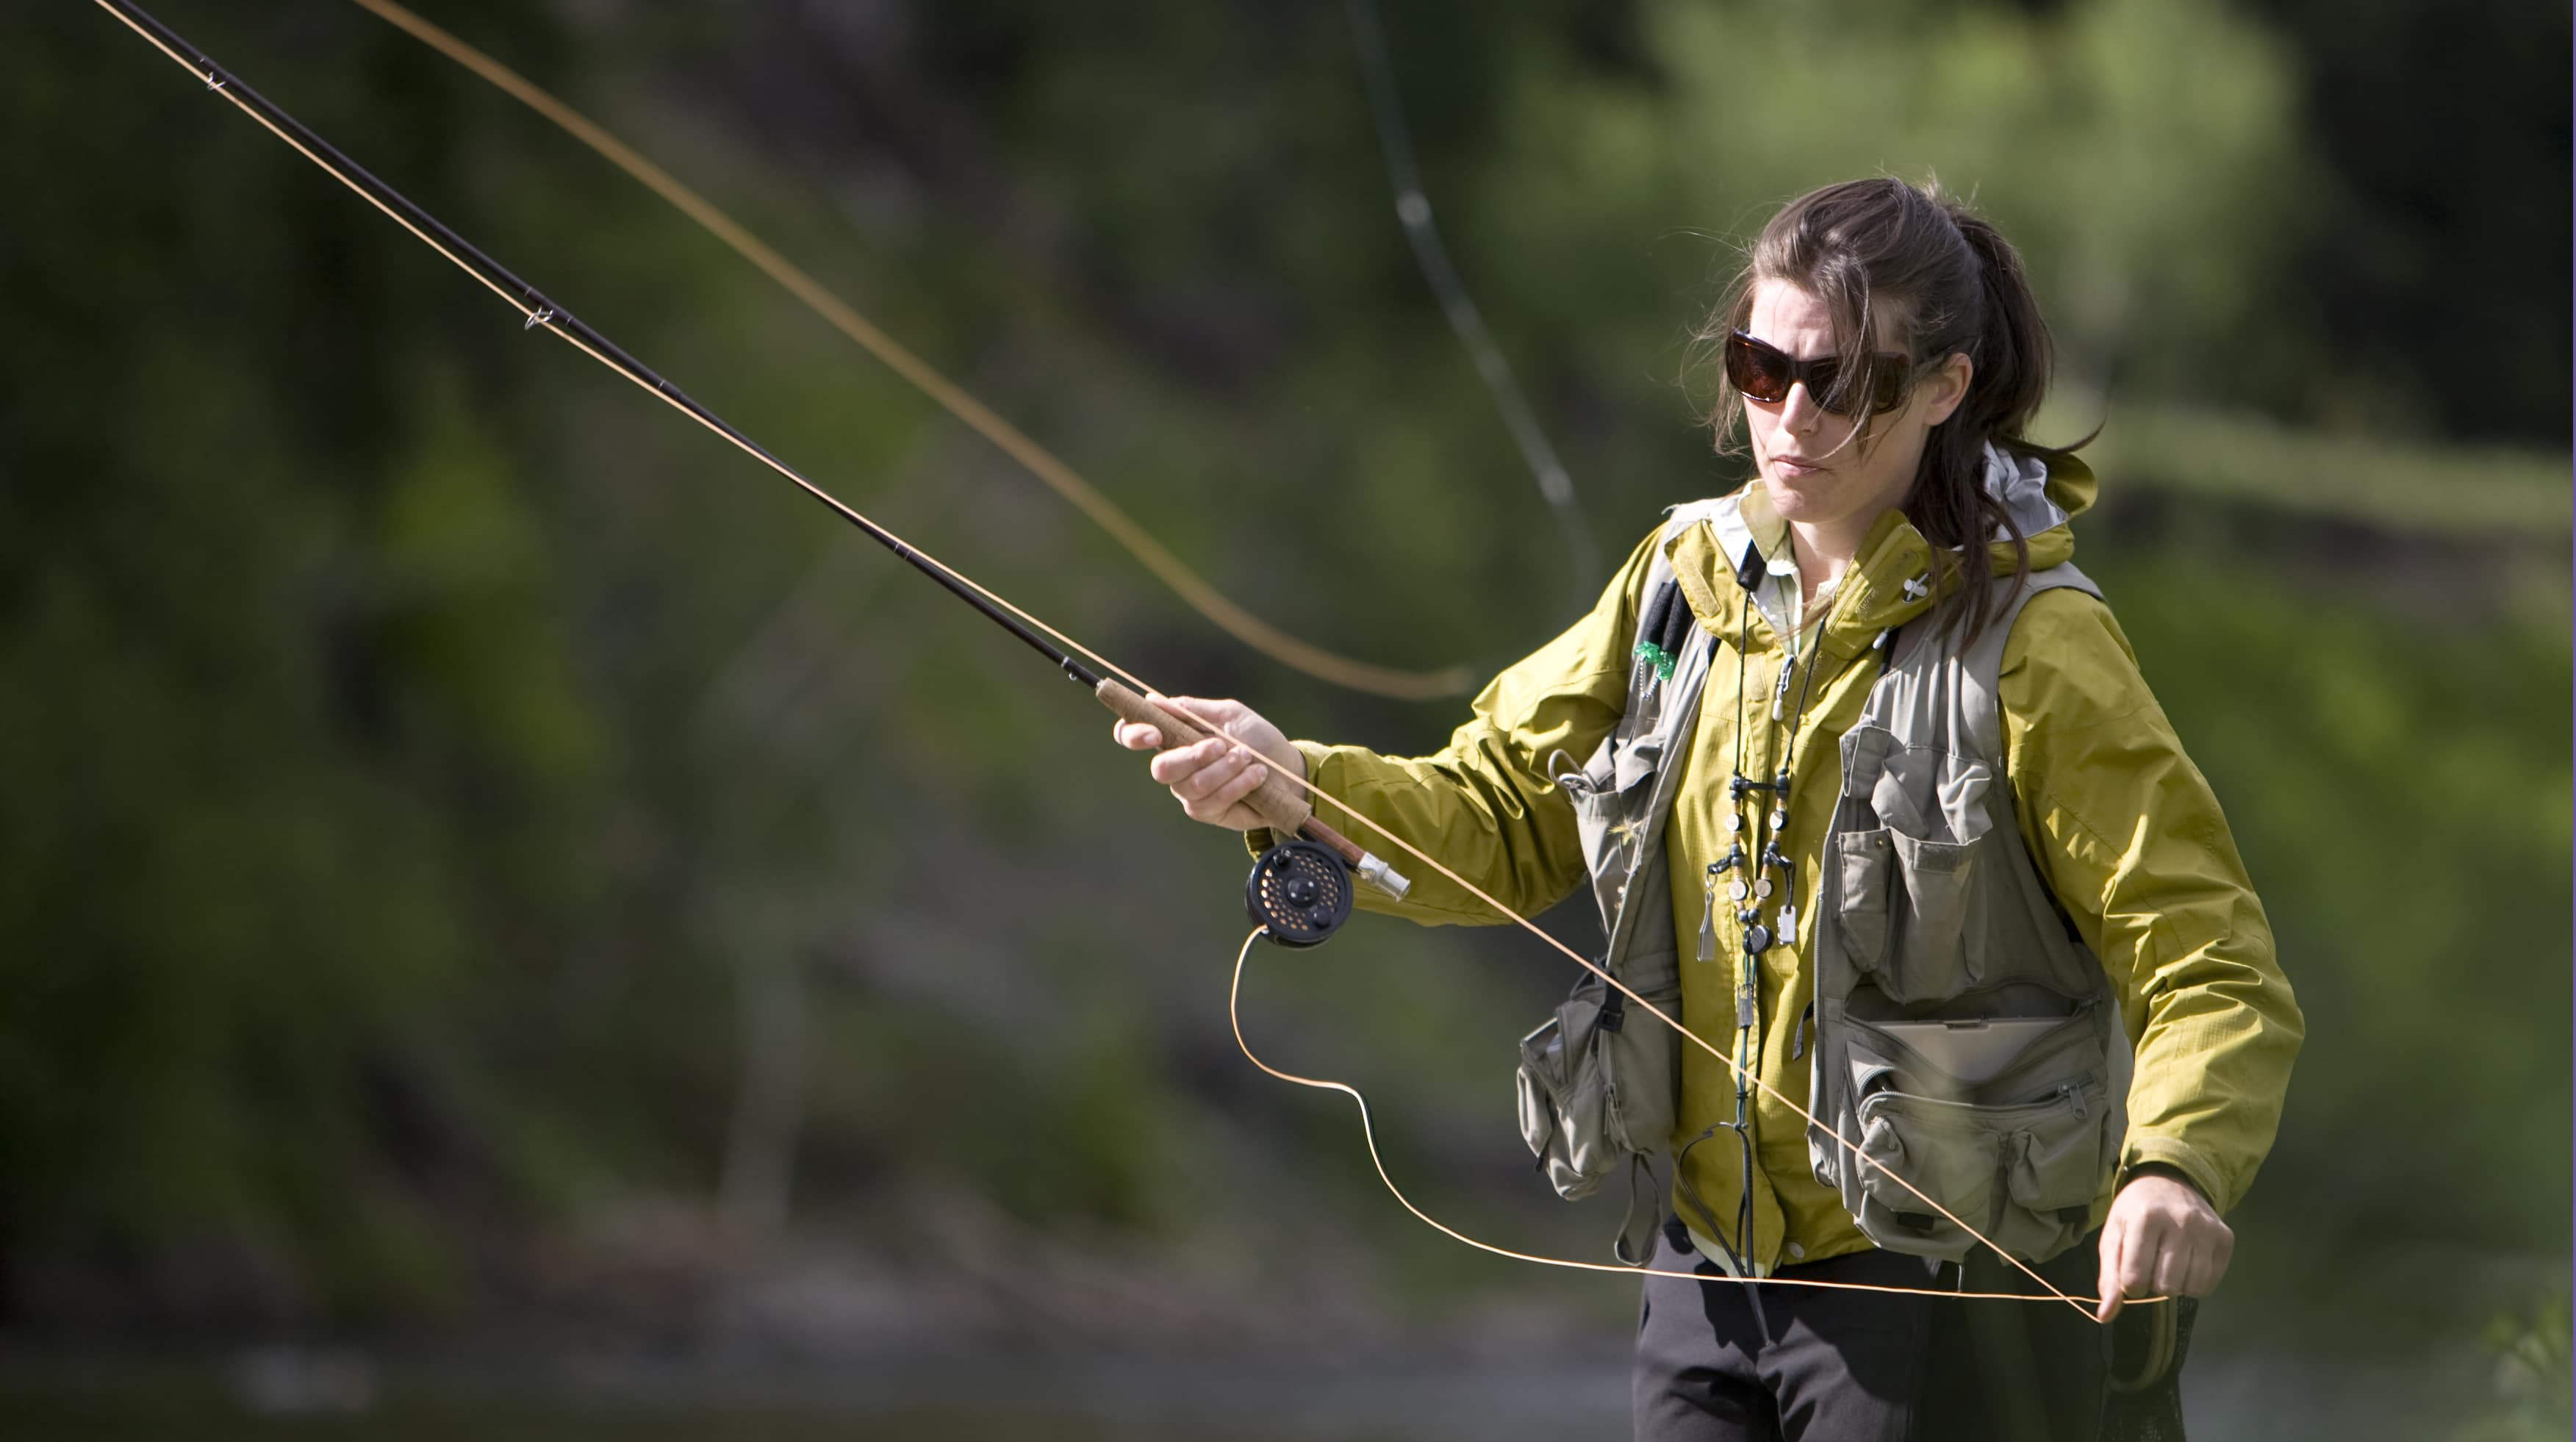 Woman fly fishing in British Columbia.